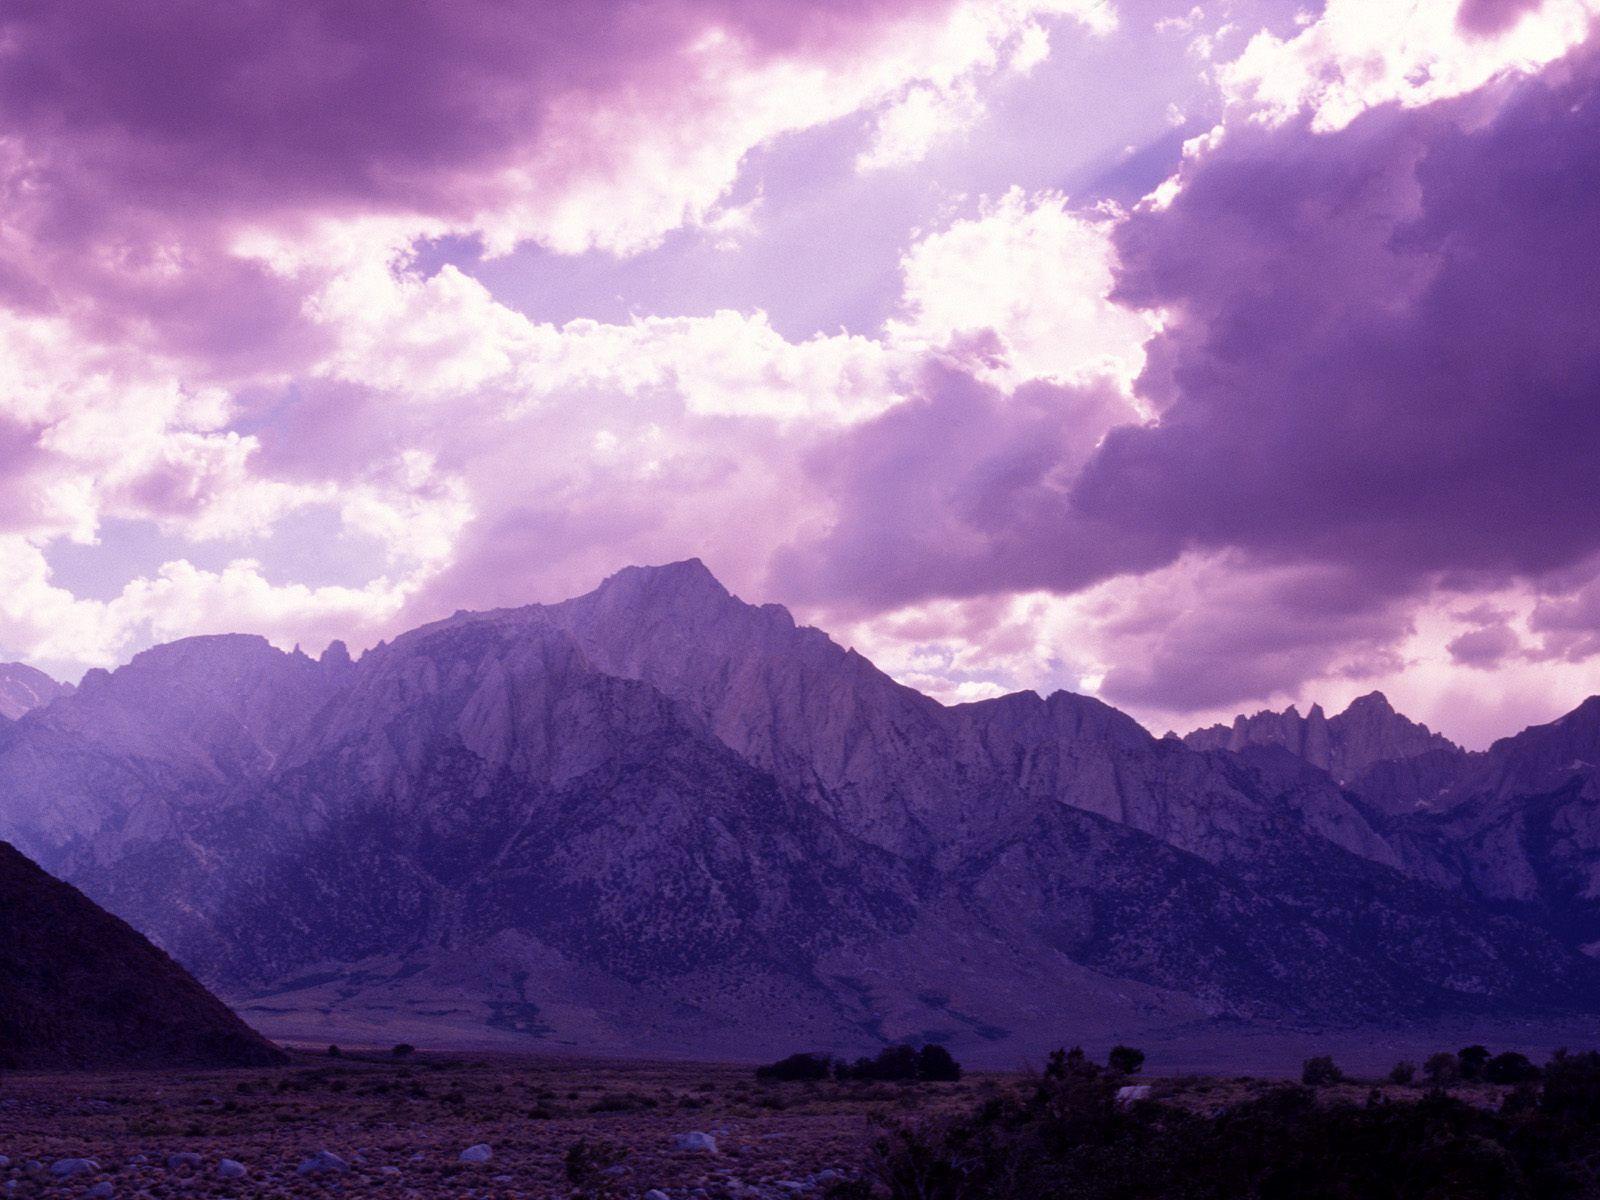 Purple Mountains Google Search Purple Sky Mountain Wallpaper Waterfall Wallpaper